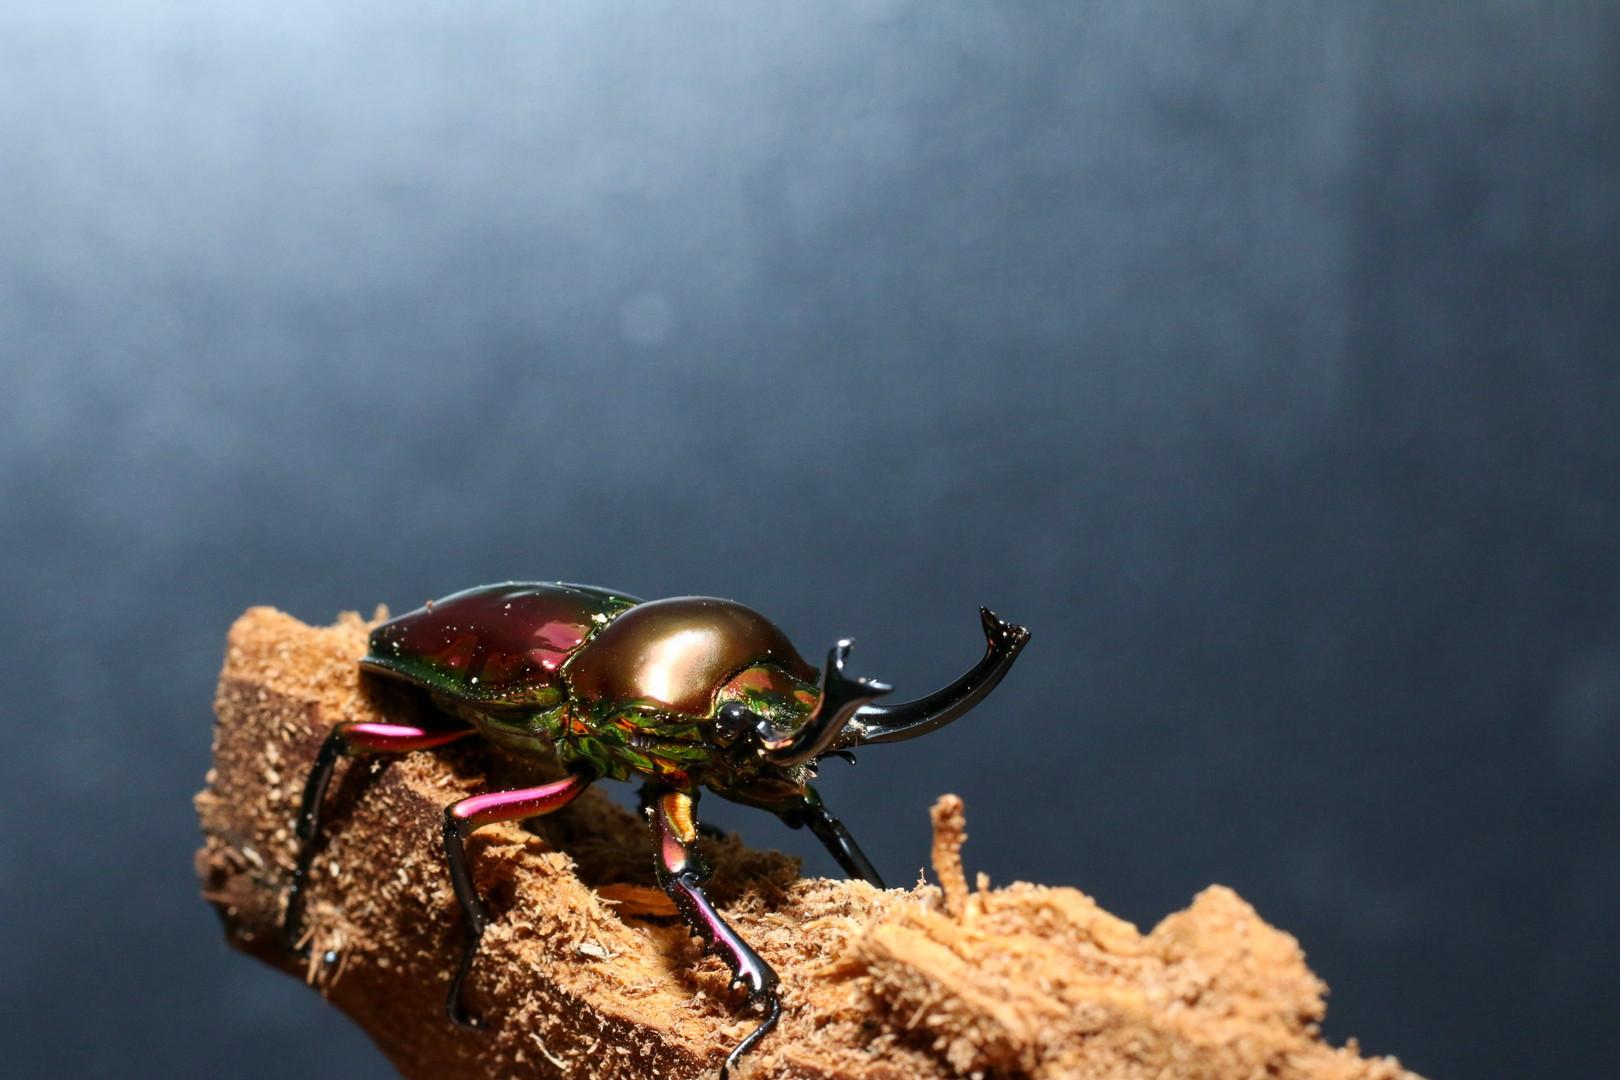 Red Rainbow Stag Beetle